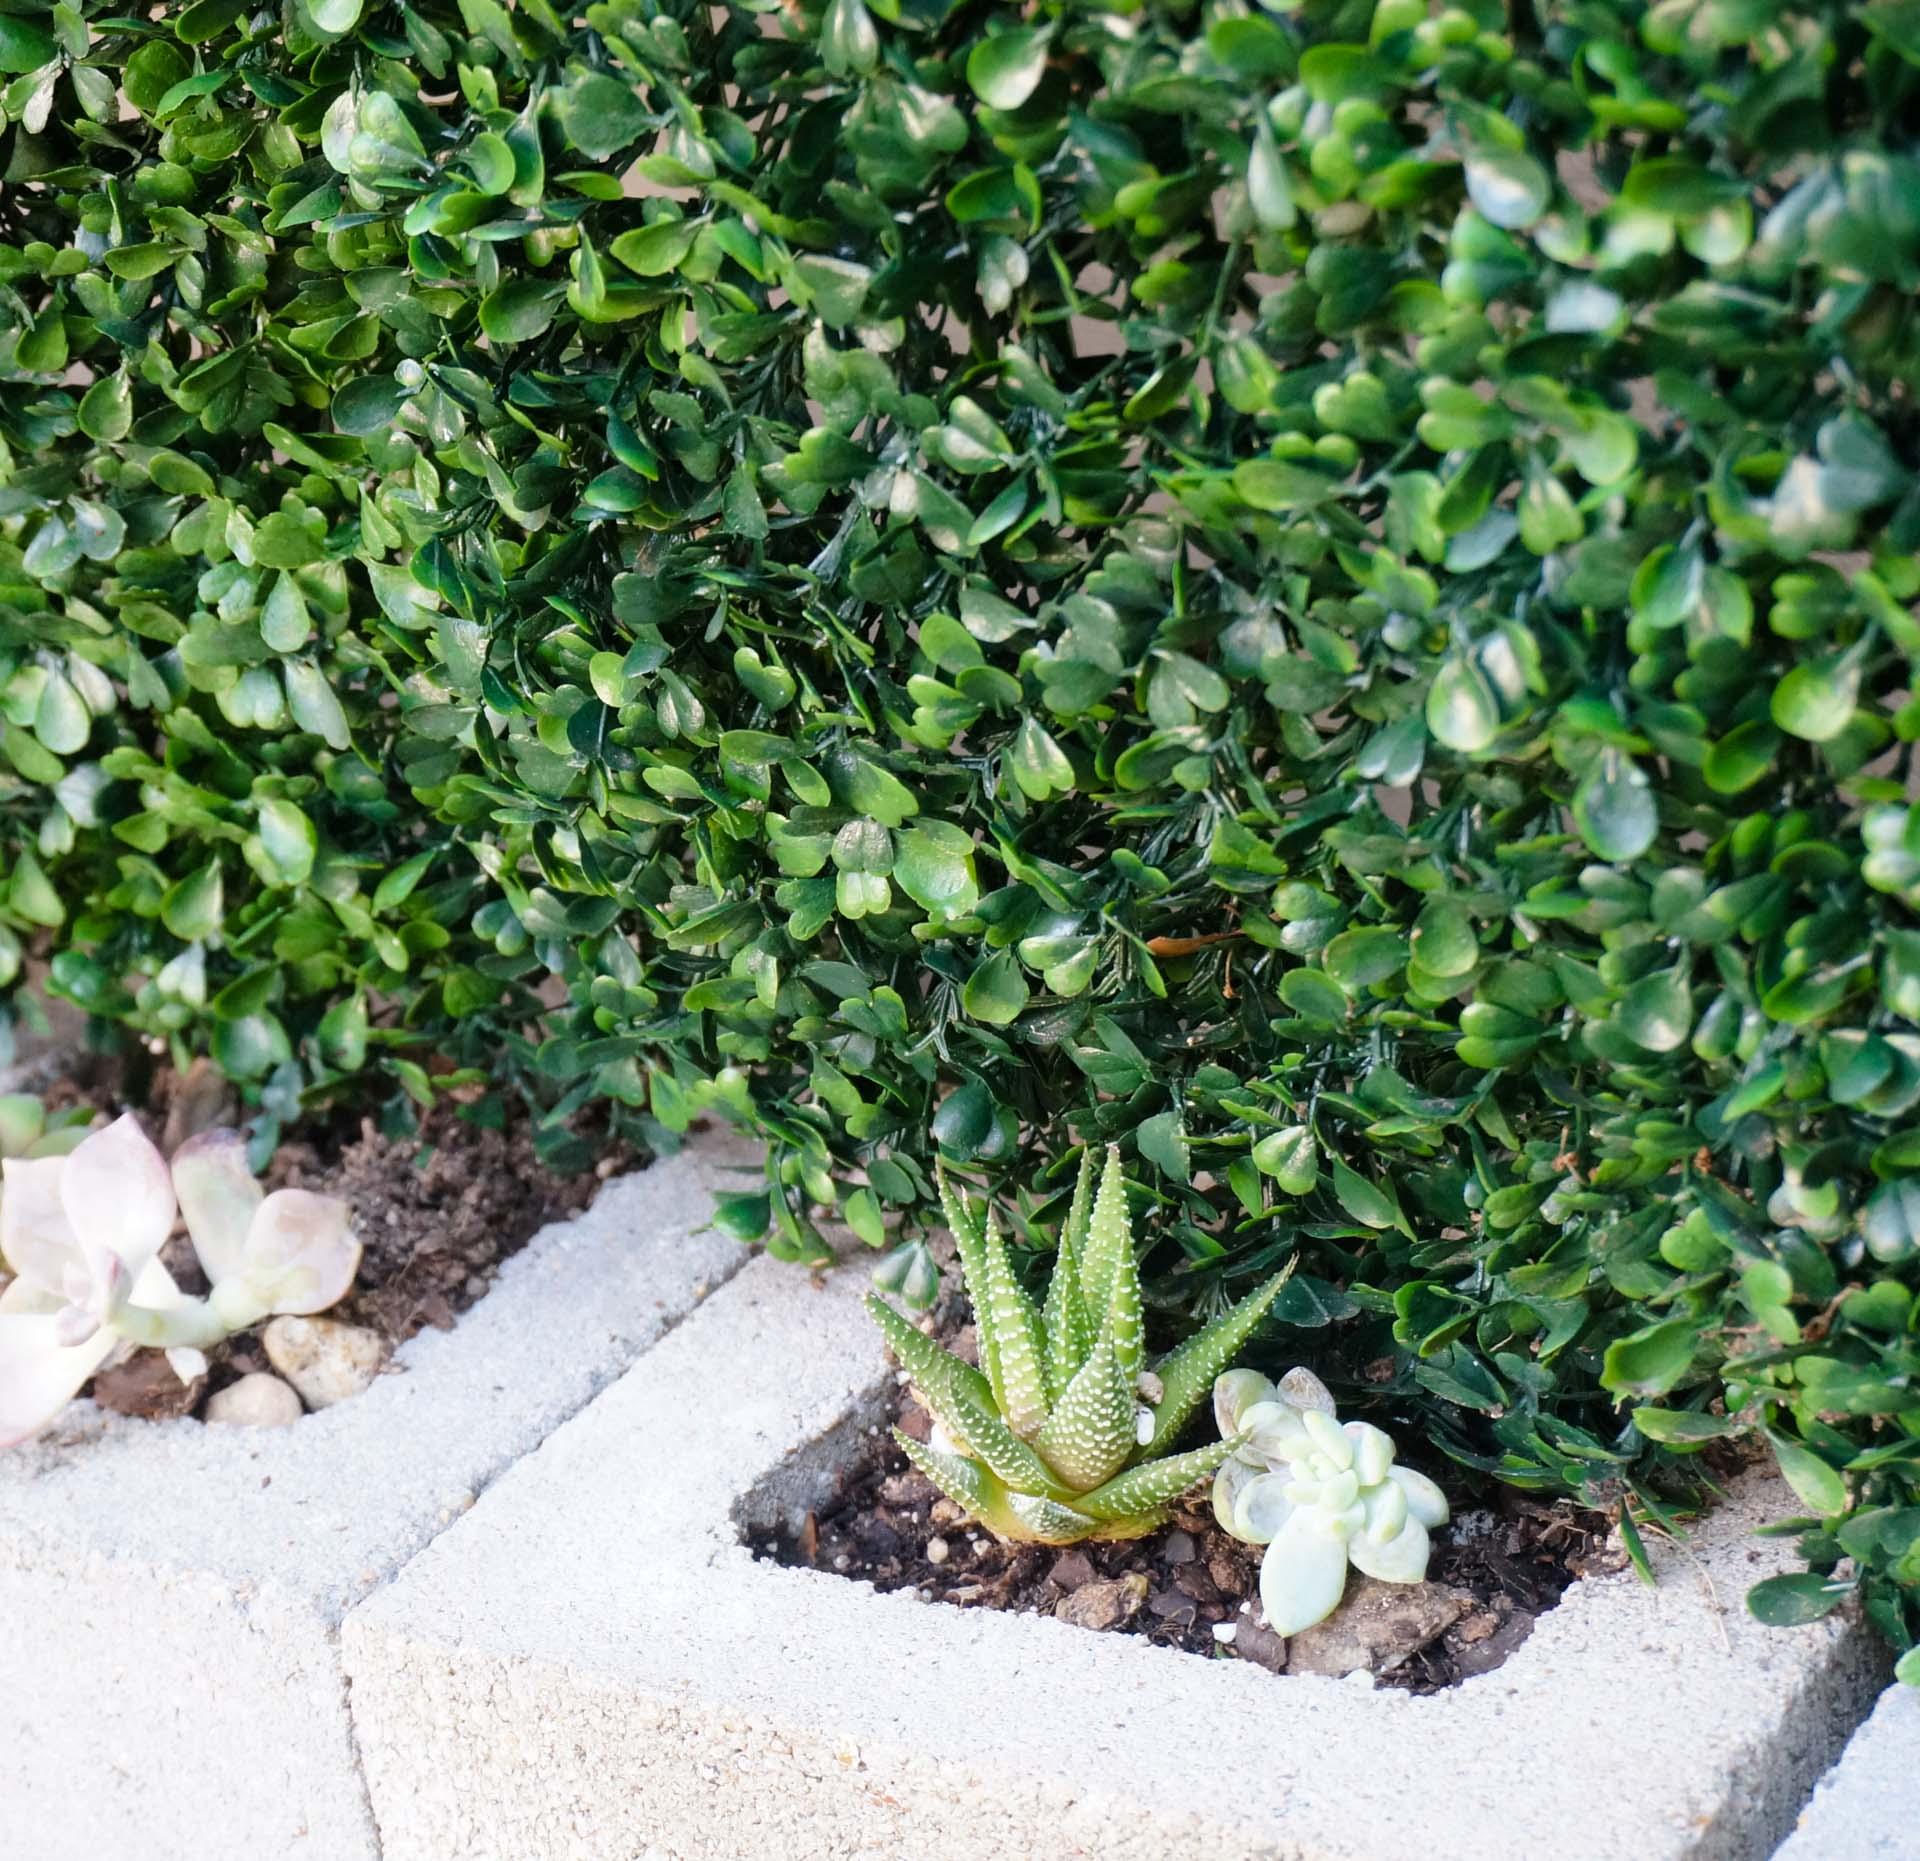 Succulent garden greenery